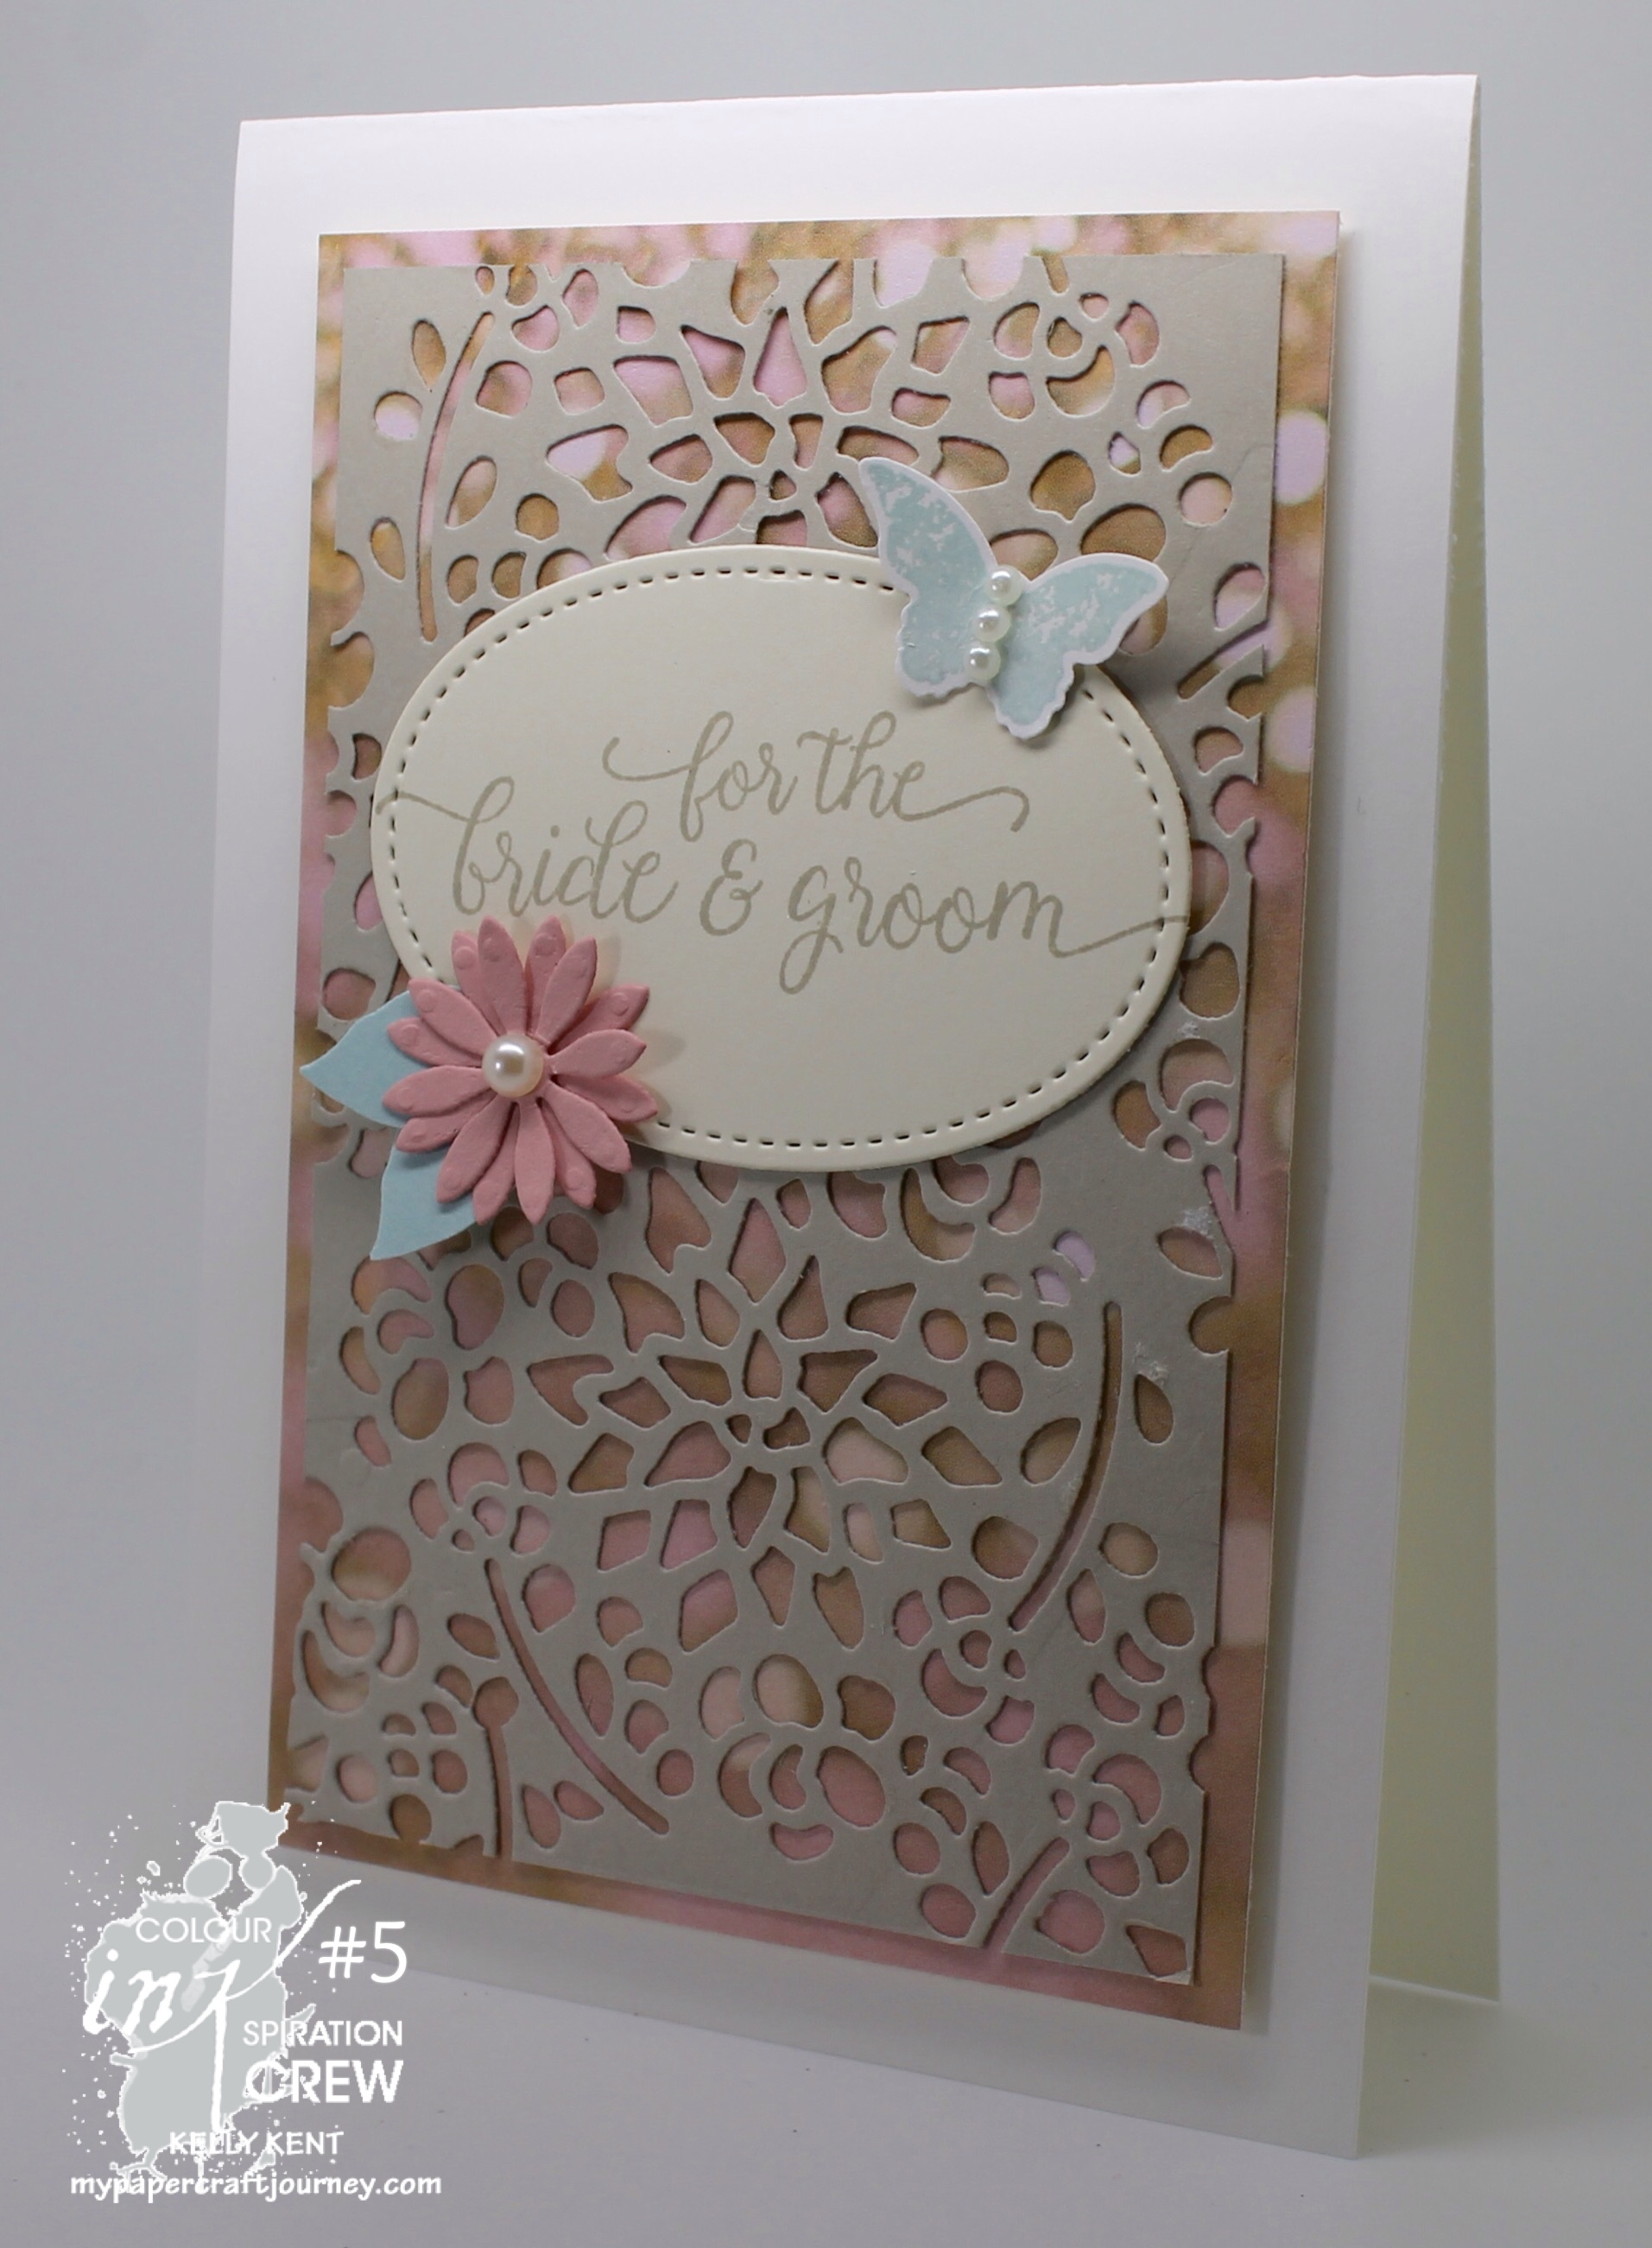 Colour INKspiration #05 - Wedding Card. Kelly Kent - mypapercraftjourney.com.